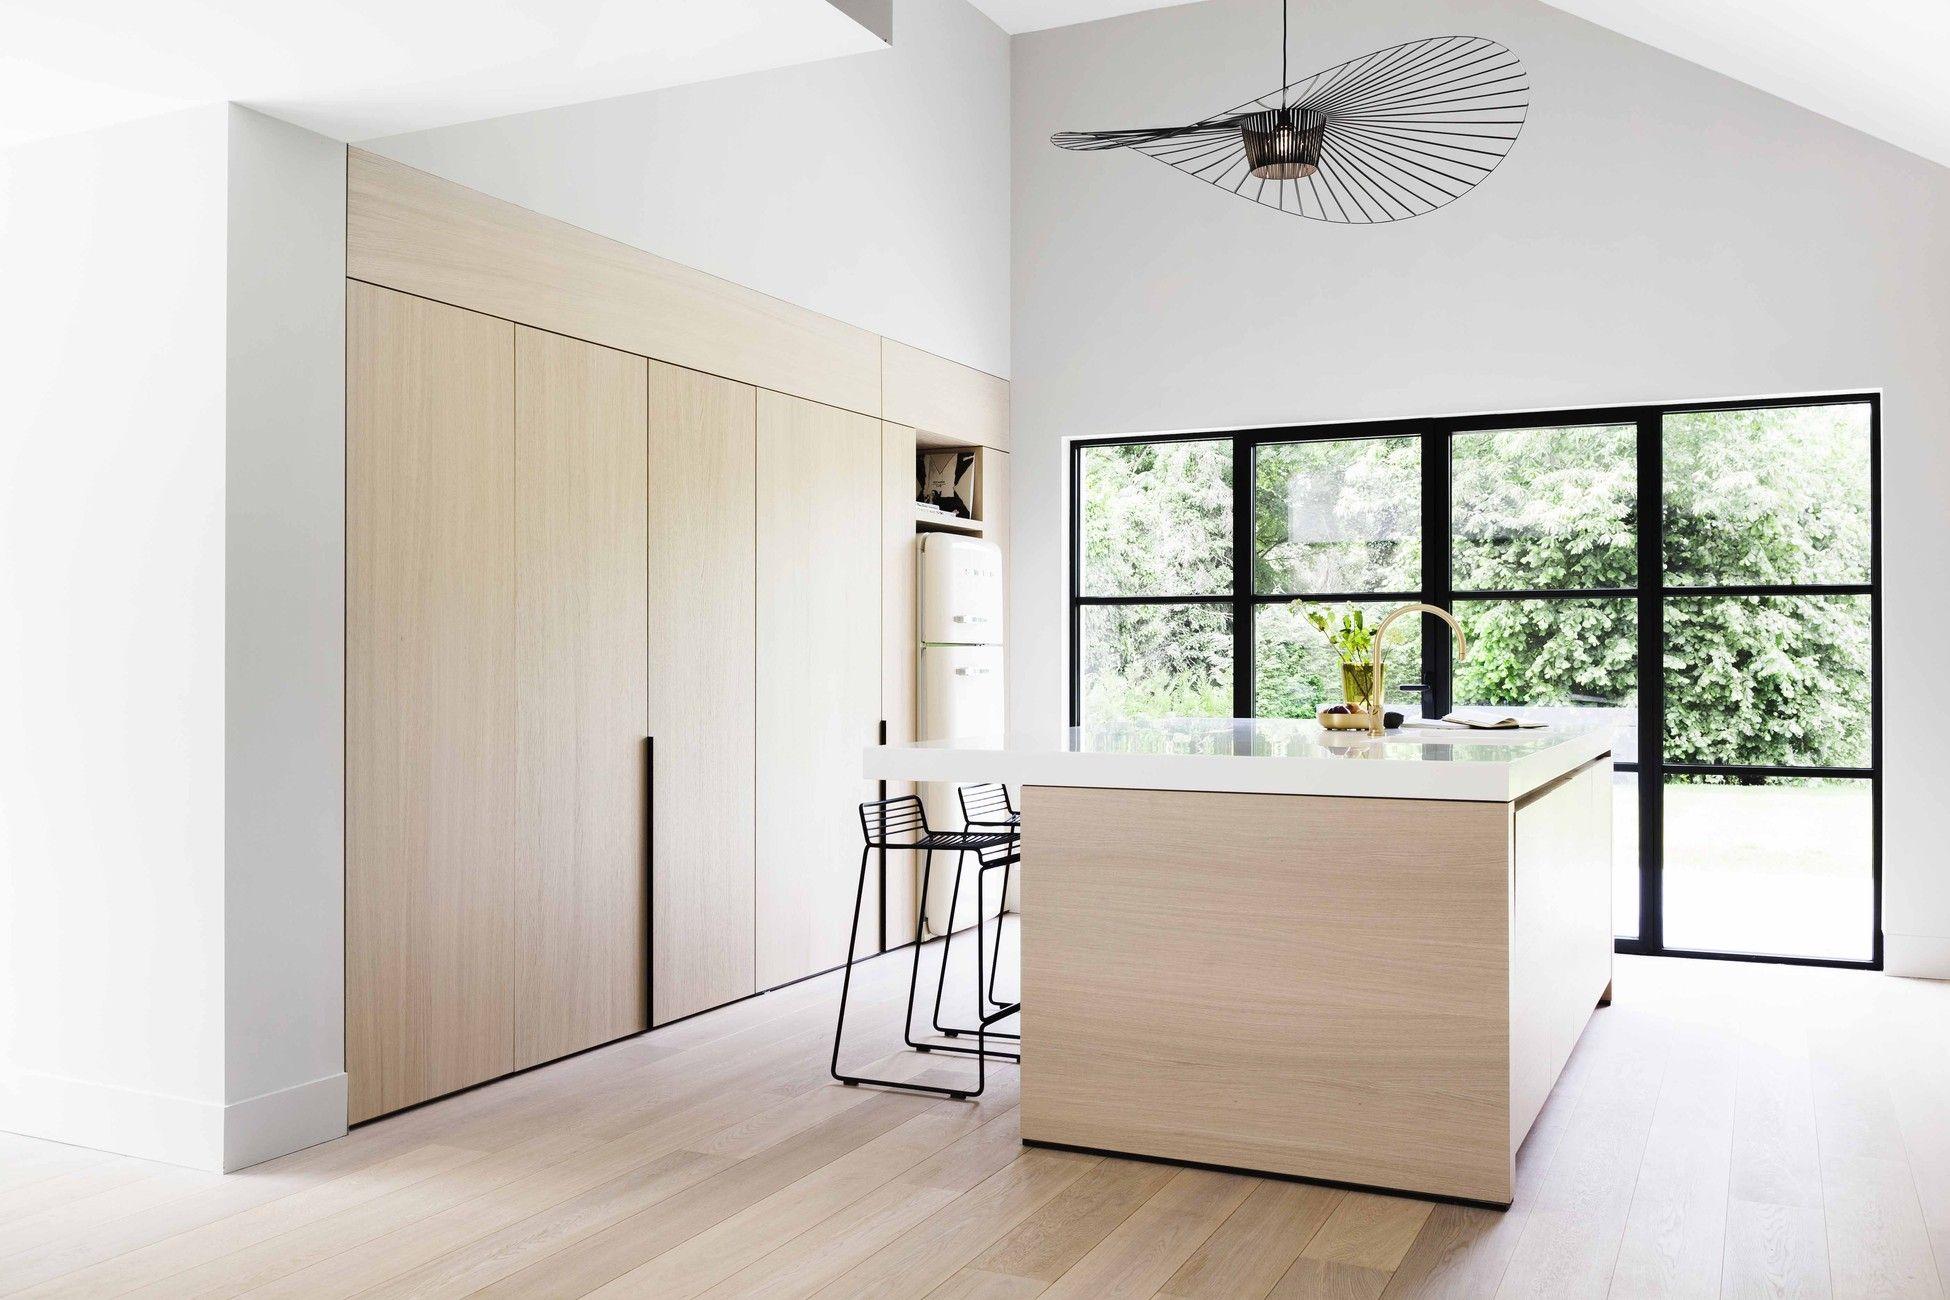 Moderne lichte eilandkeuken houten keuken licht werkblad stalen kozijnen kastenwand met - Trendkleur keuken ...